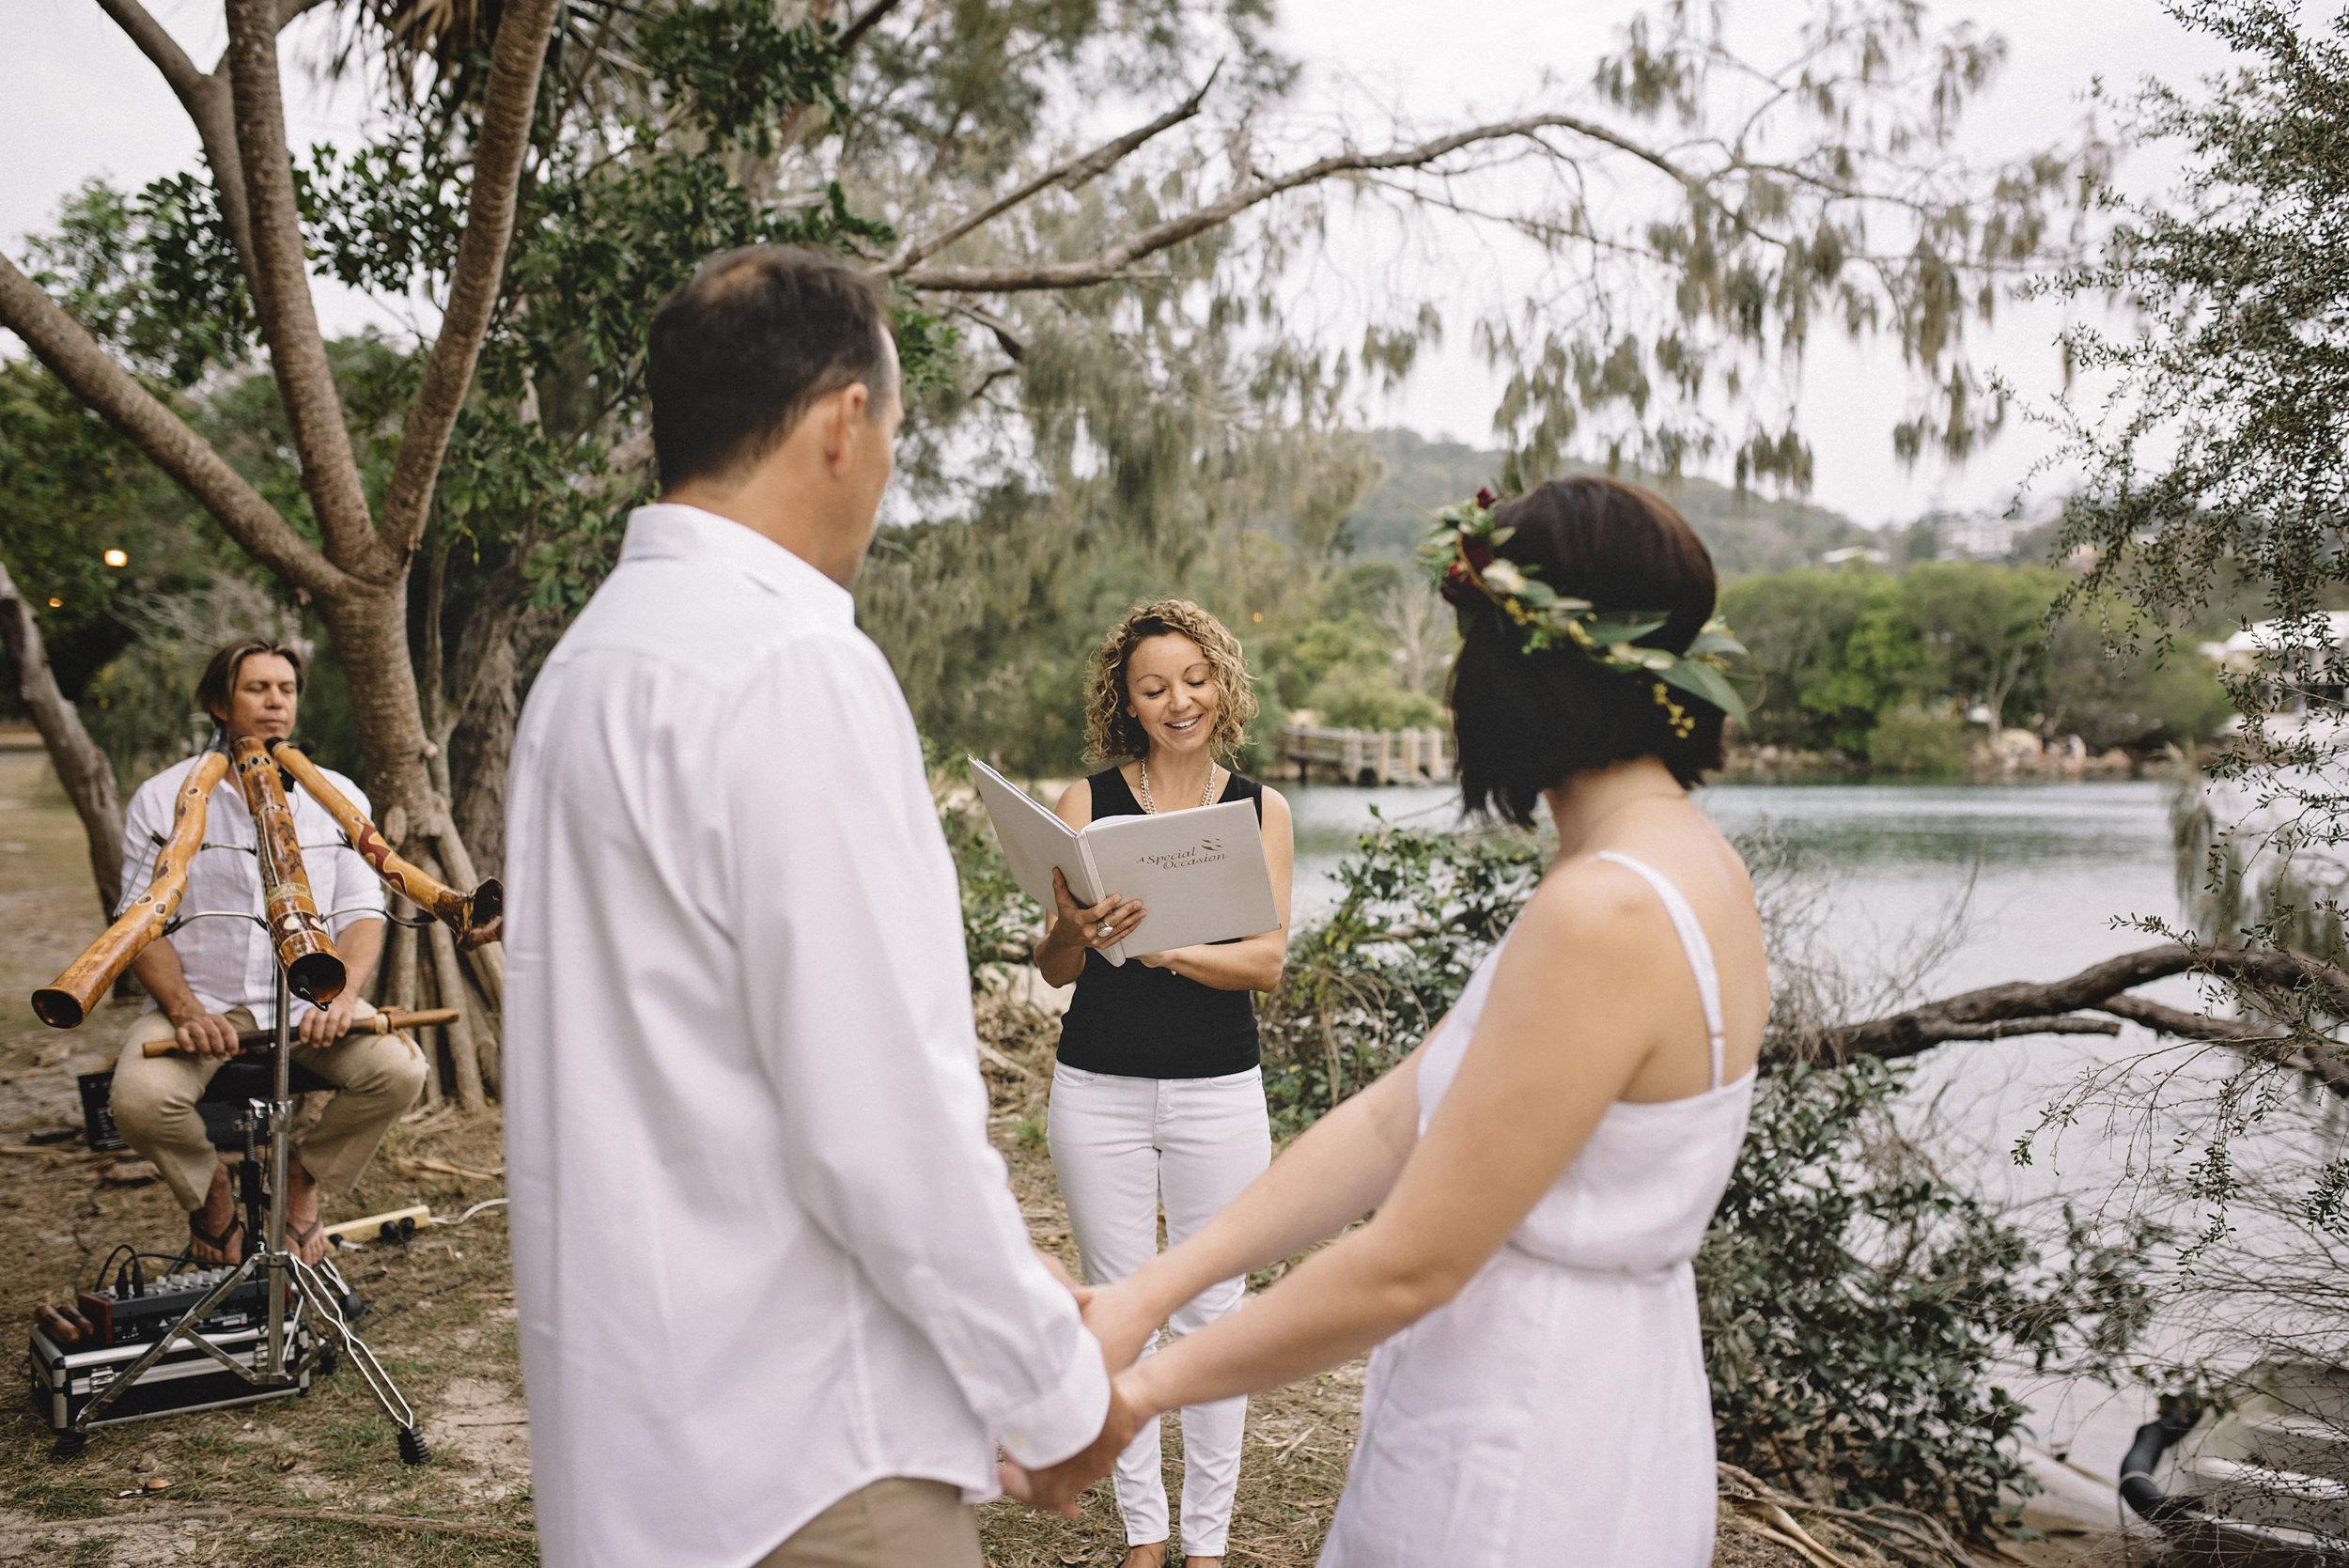 married by moonlight didge ceremony fancy and free weddings.jpg